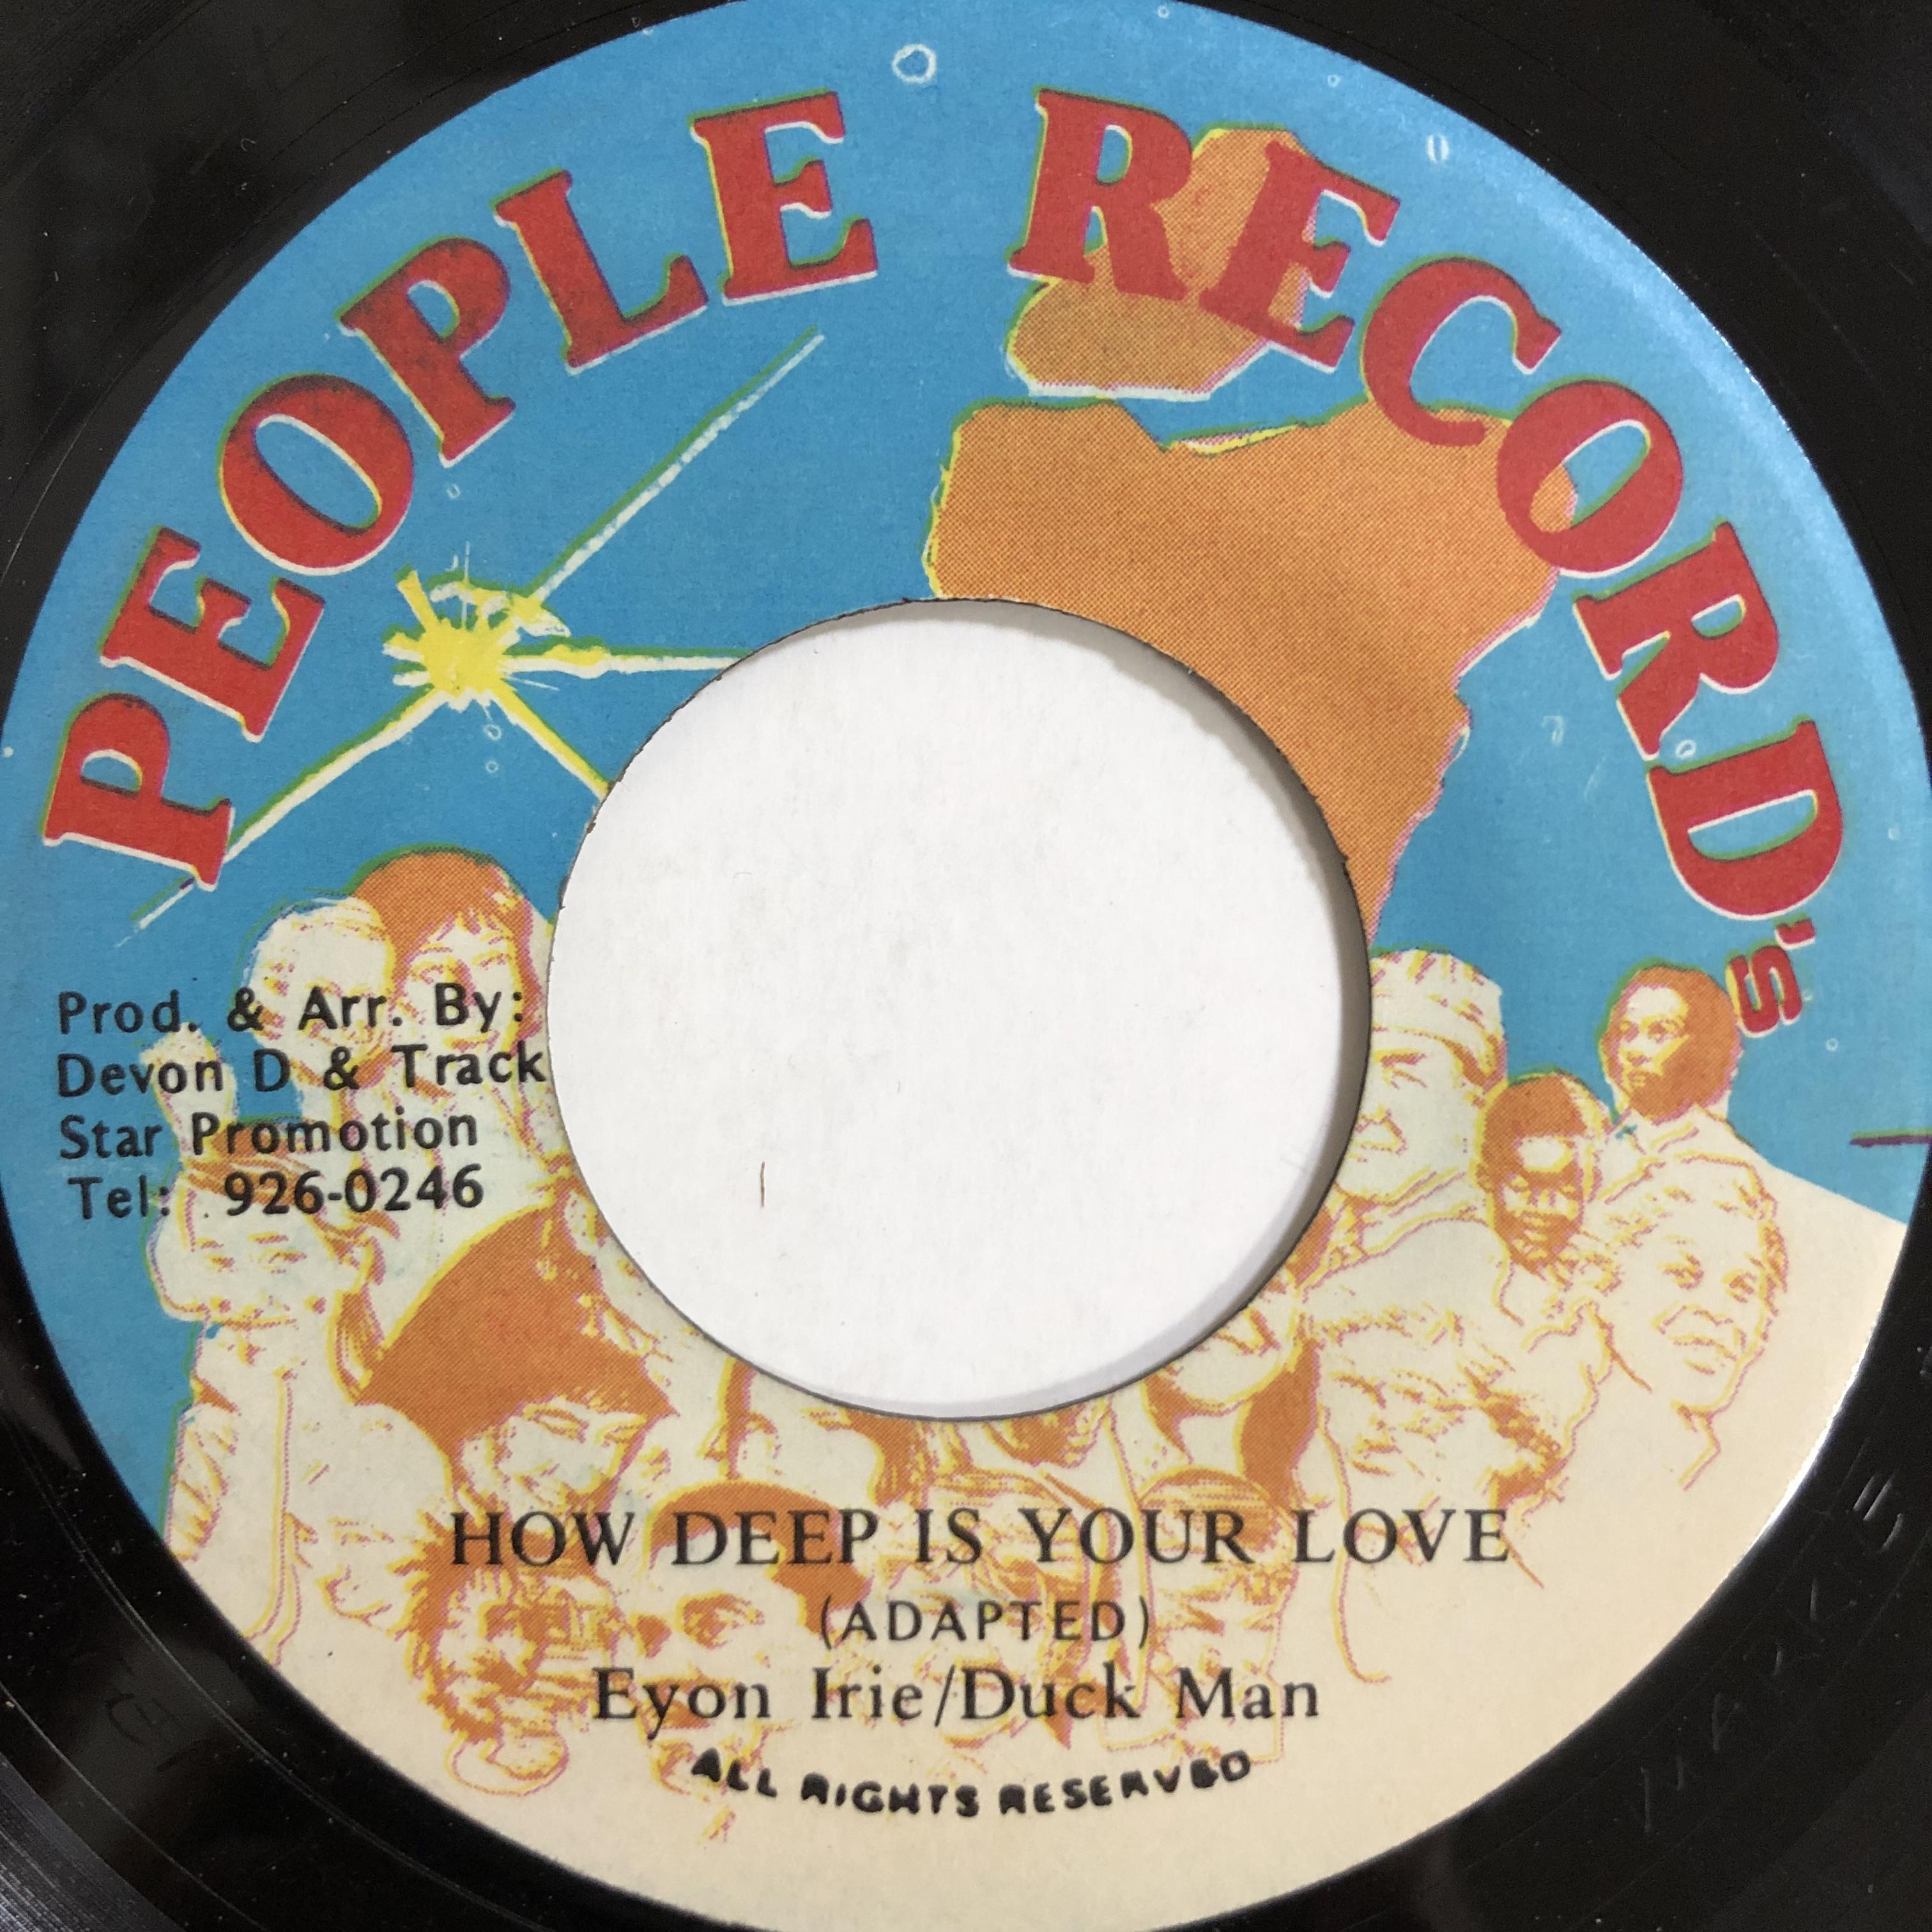 Eyon Irie & Duck Man - How Deep Is Your Love【7-20004】